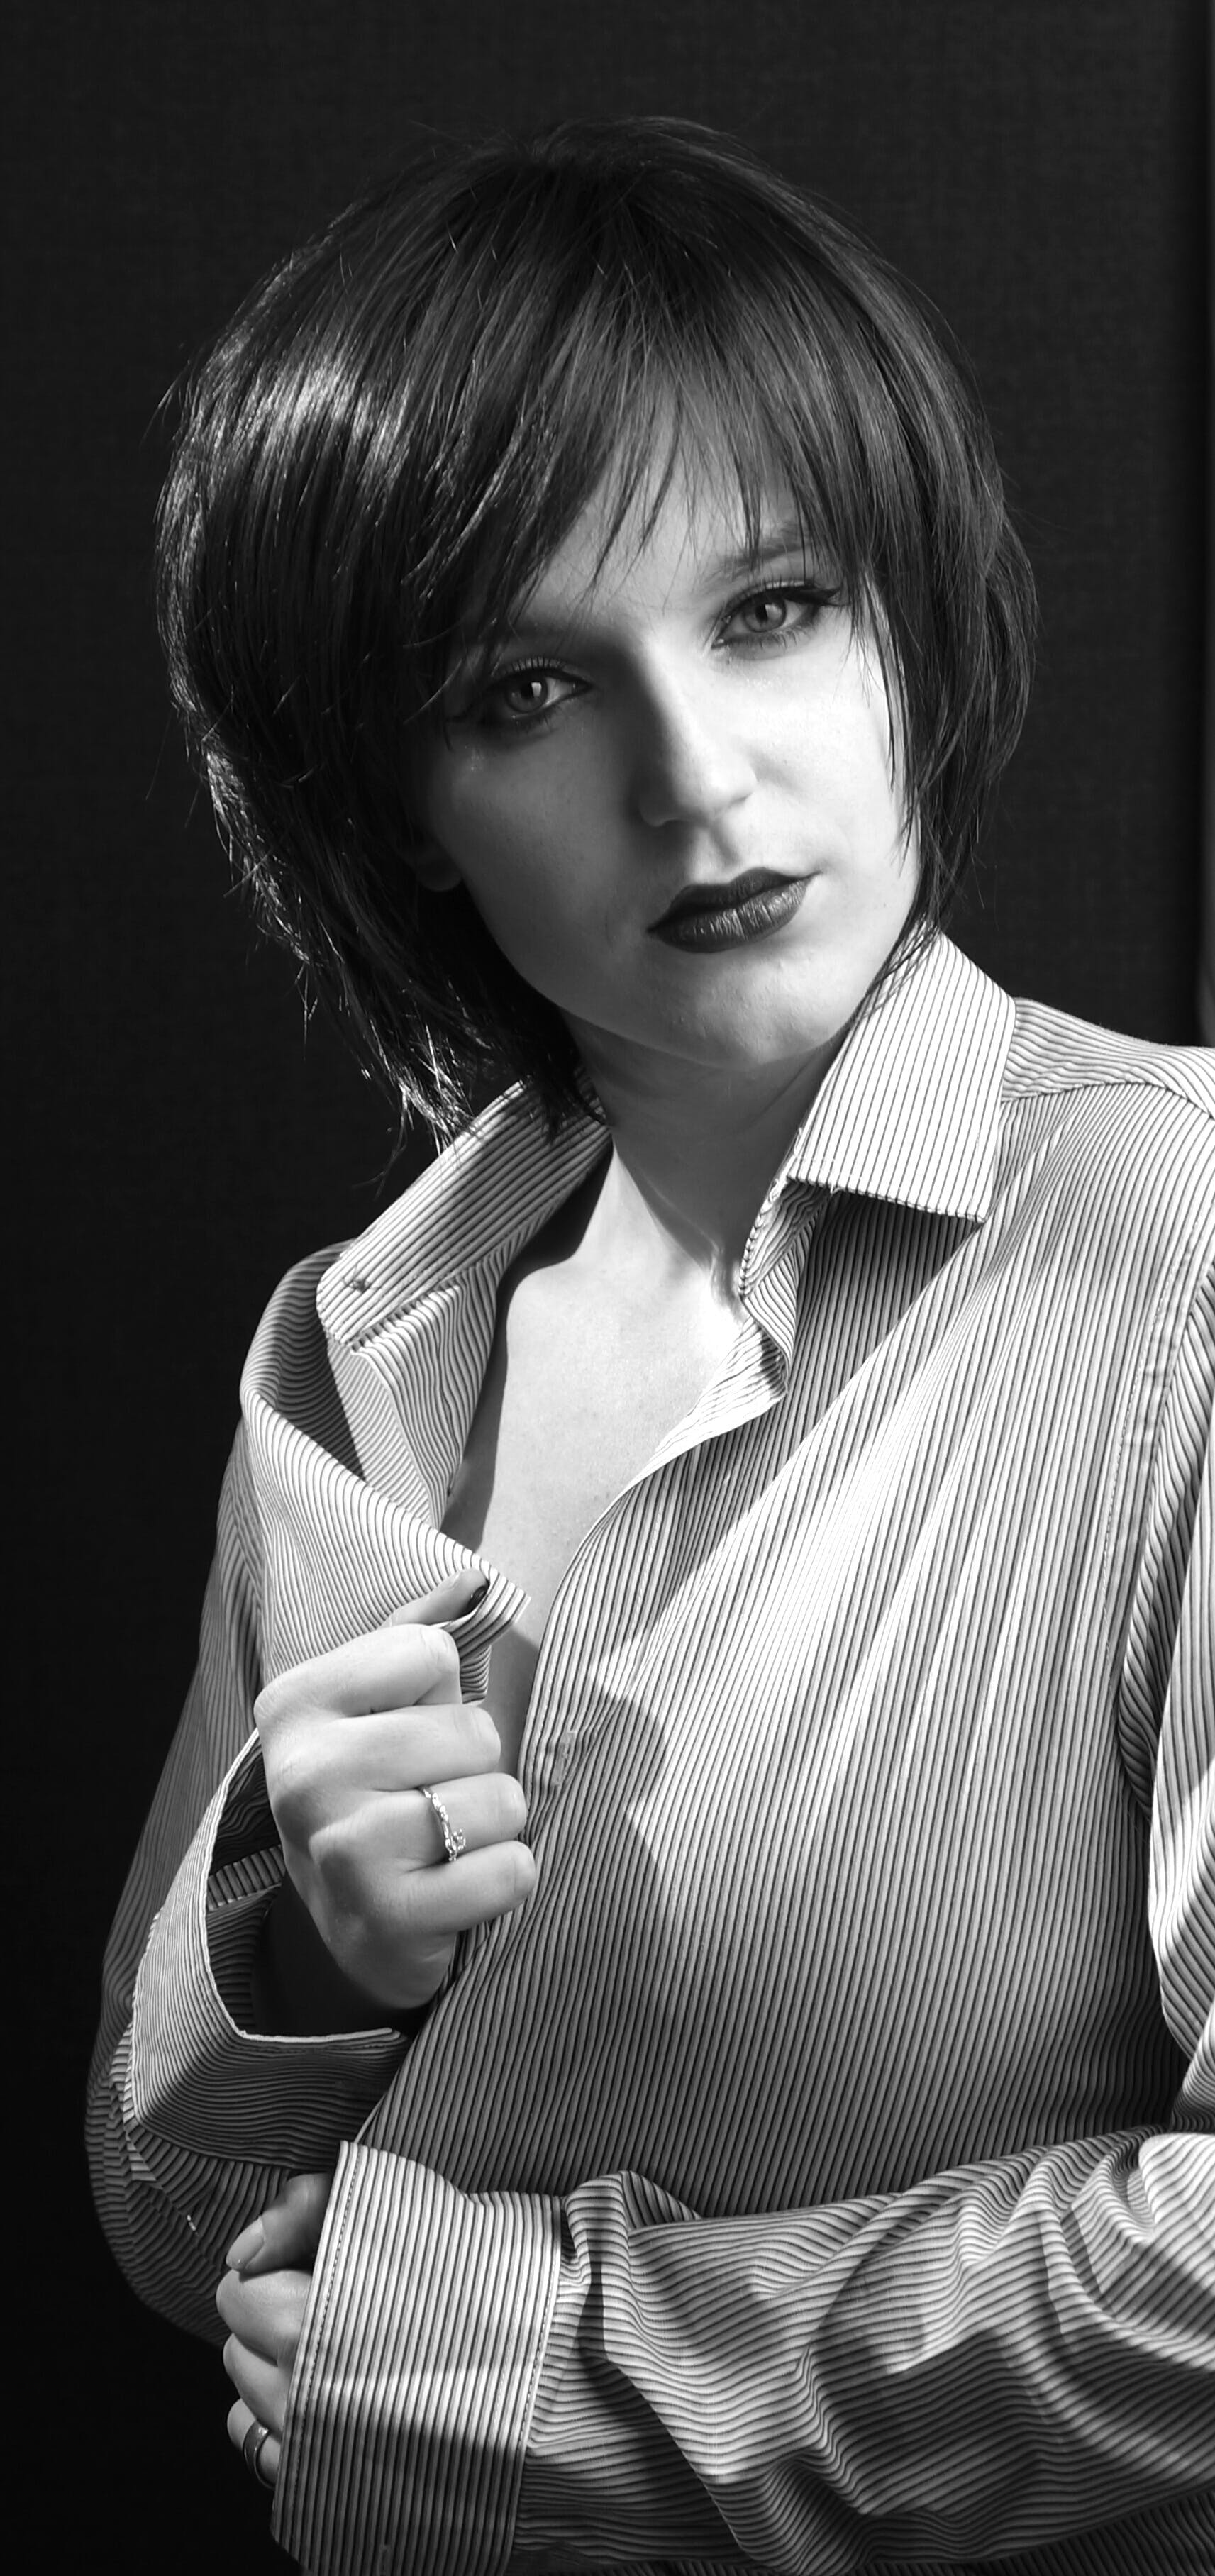 Grayscale Photo of Woman Wearing Coat